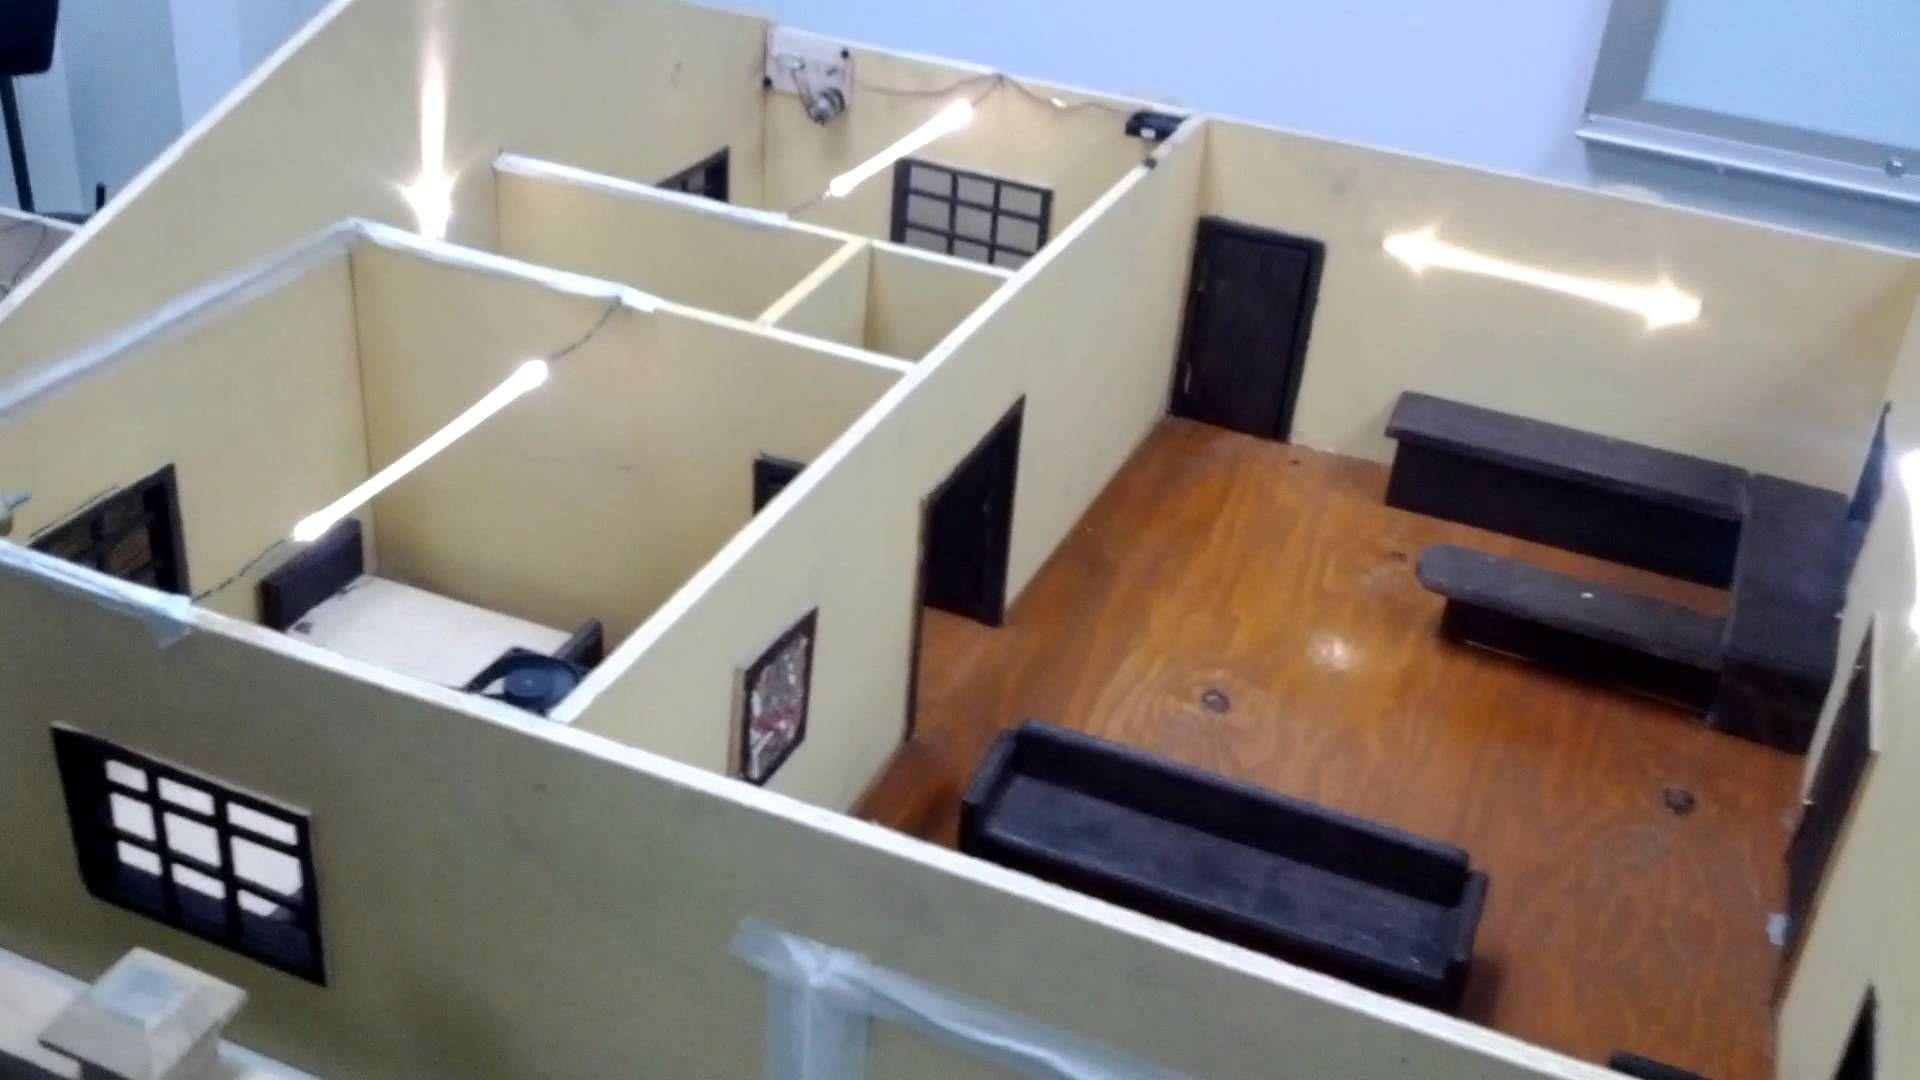 Casa Domotica con Arduino, raspberry pi, plc ,server php